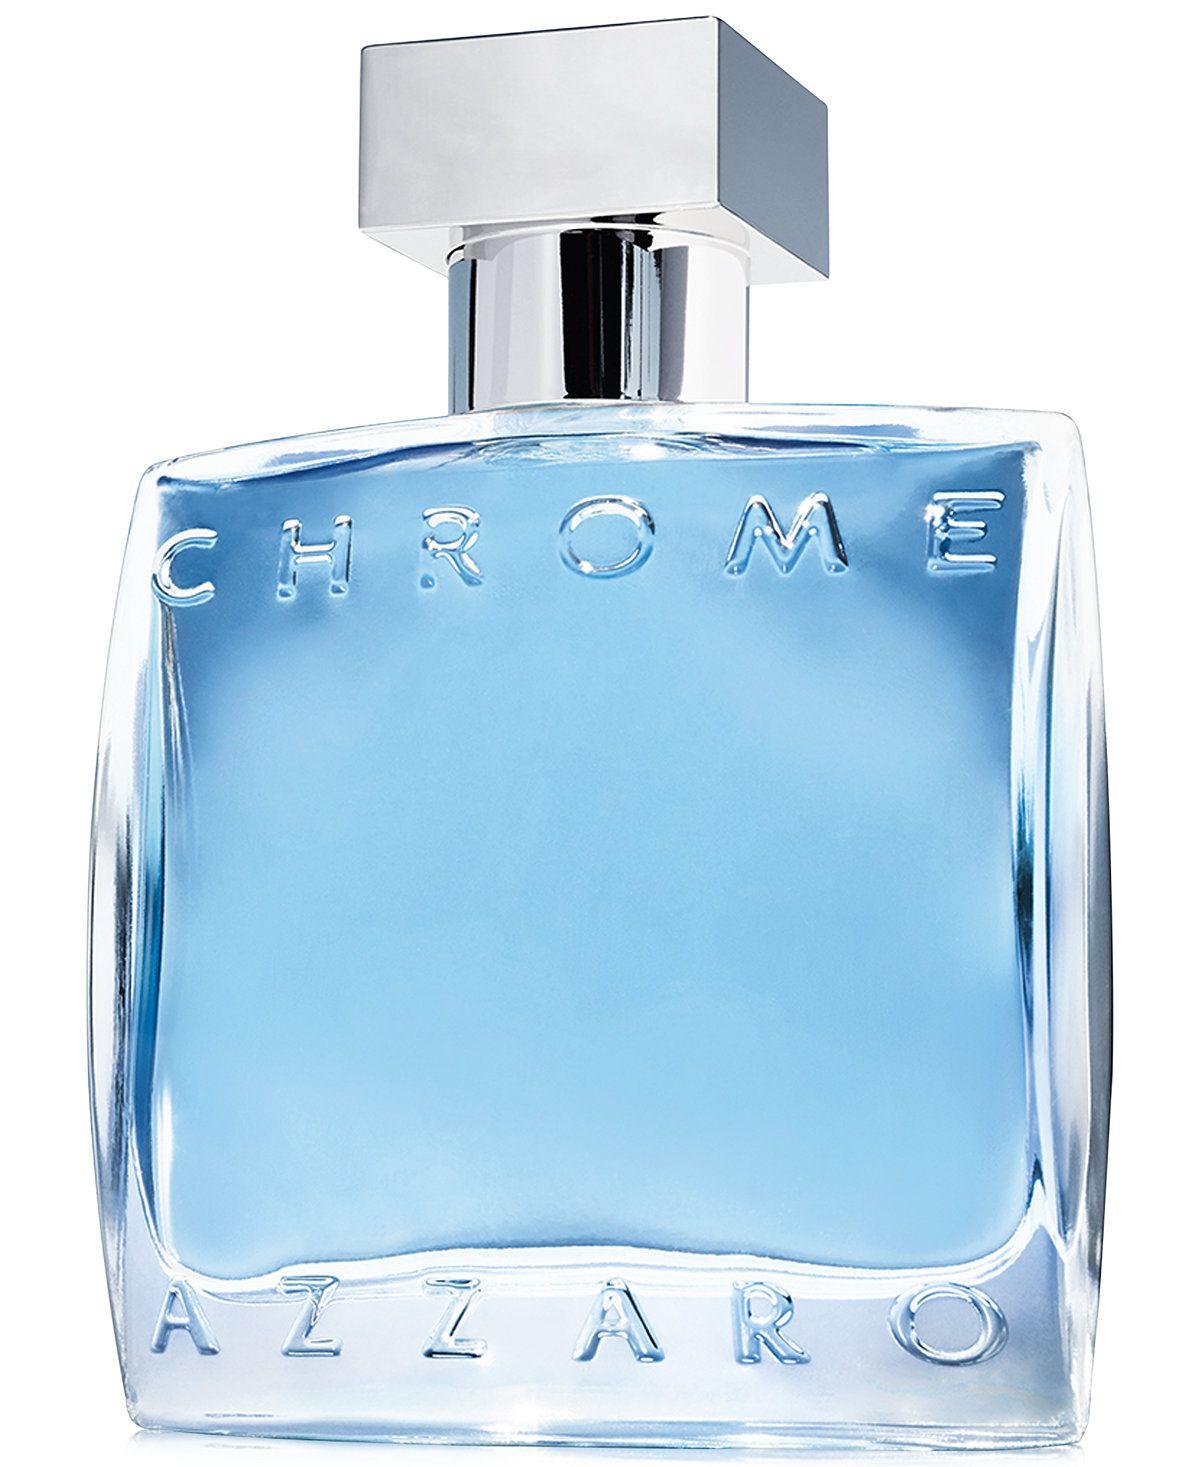 Polo Sport Woman Perfume, Eau de toilette, Fragrance